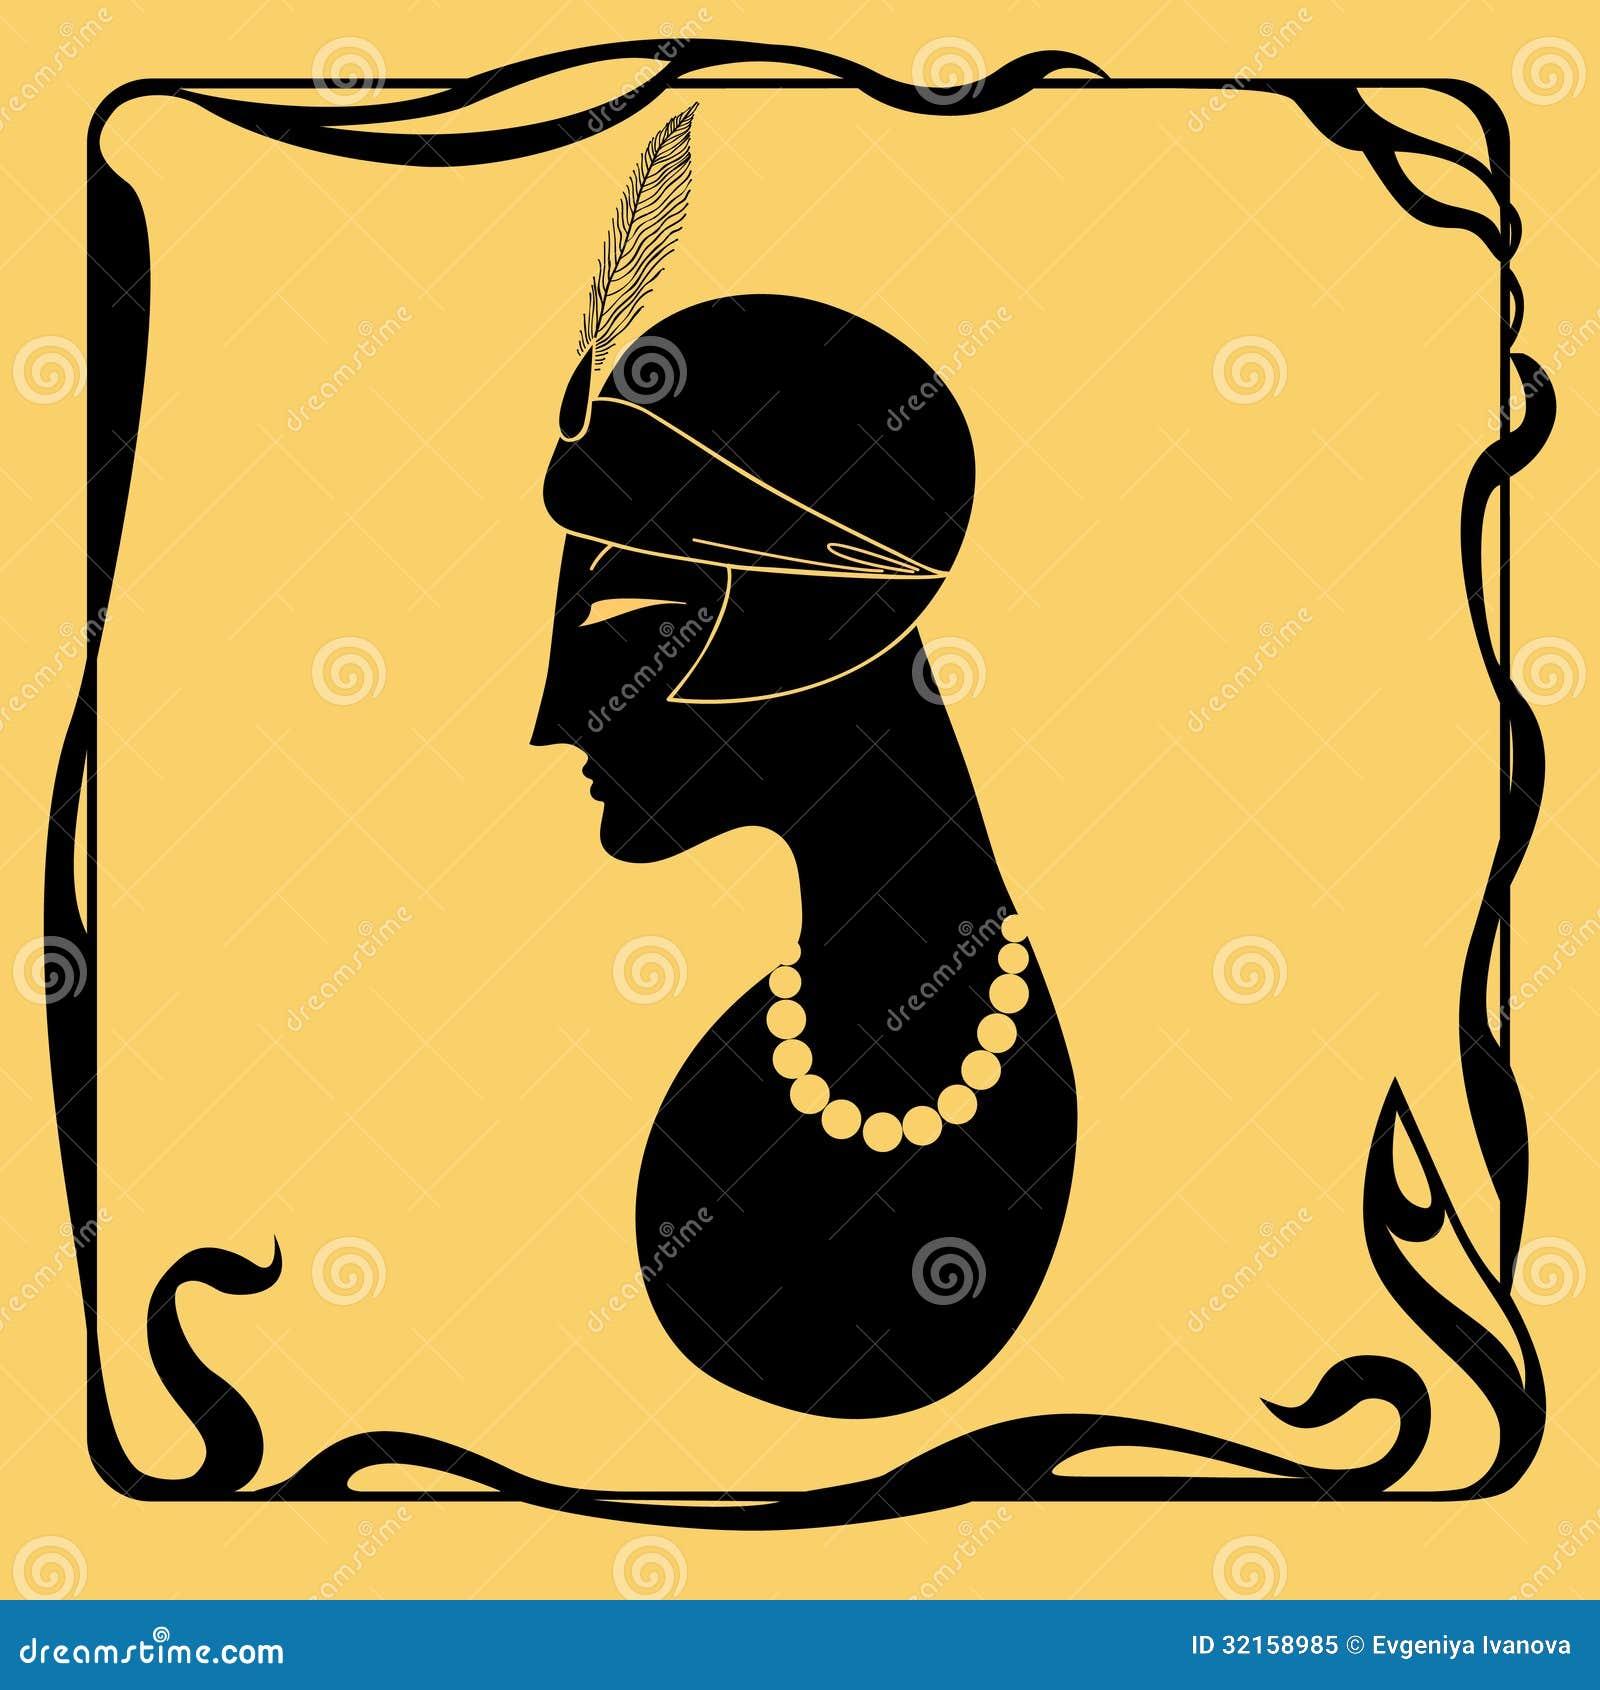 Art deco woman silhouette royalty free stock photo image 32158985